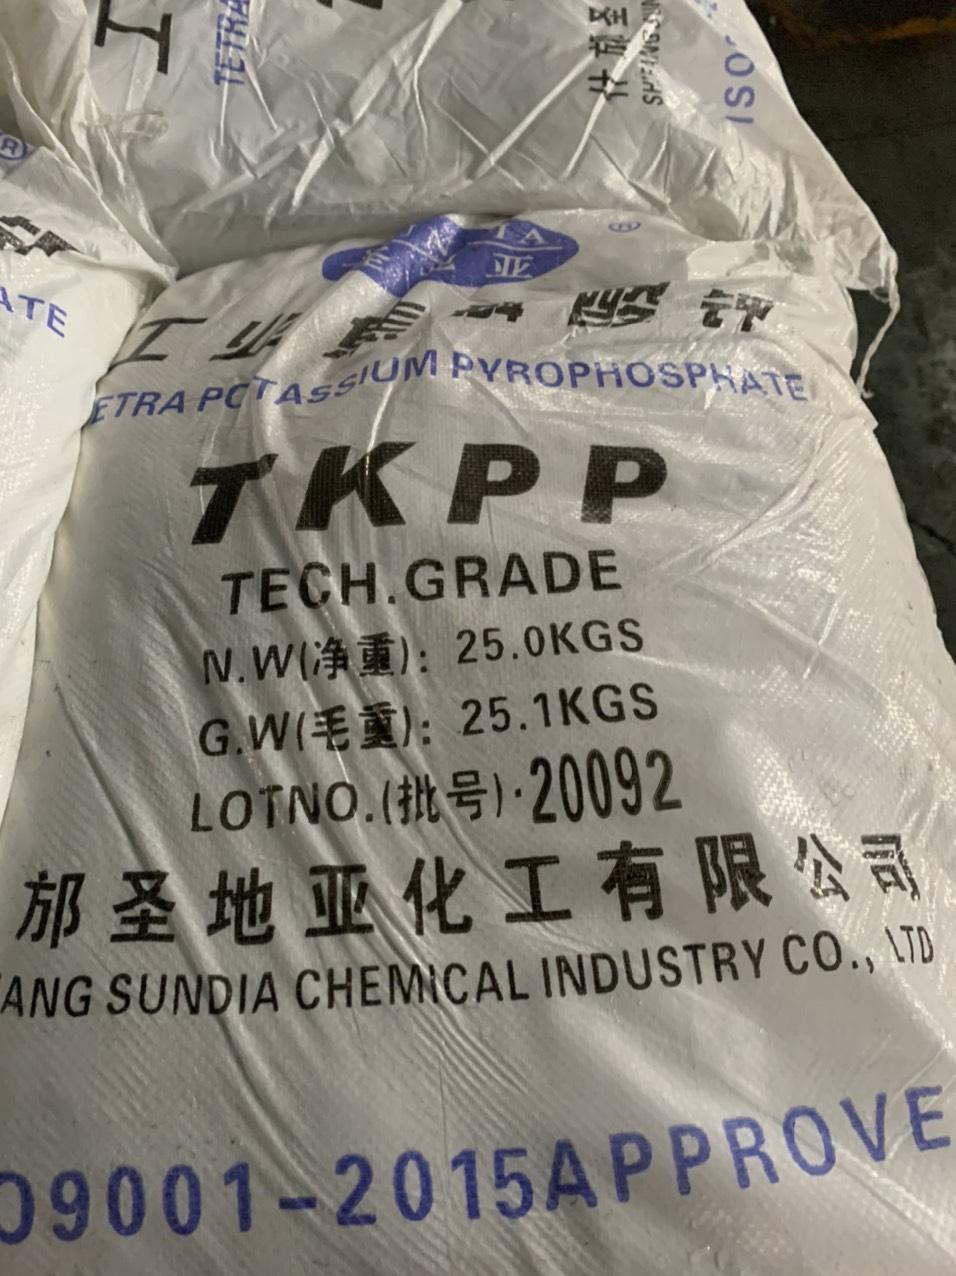 TKPP - Tetra Sodium pyrophosphate